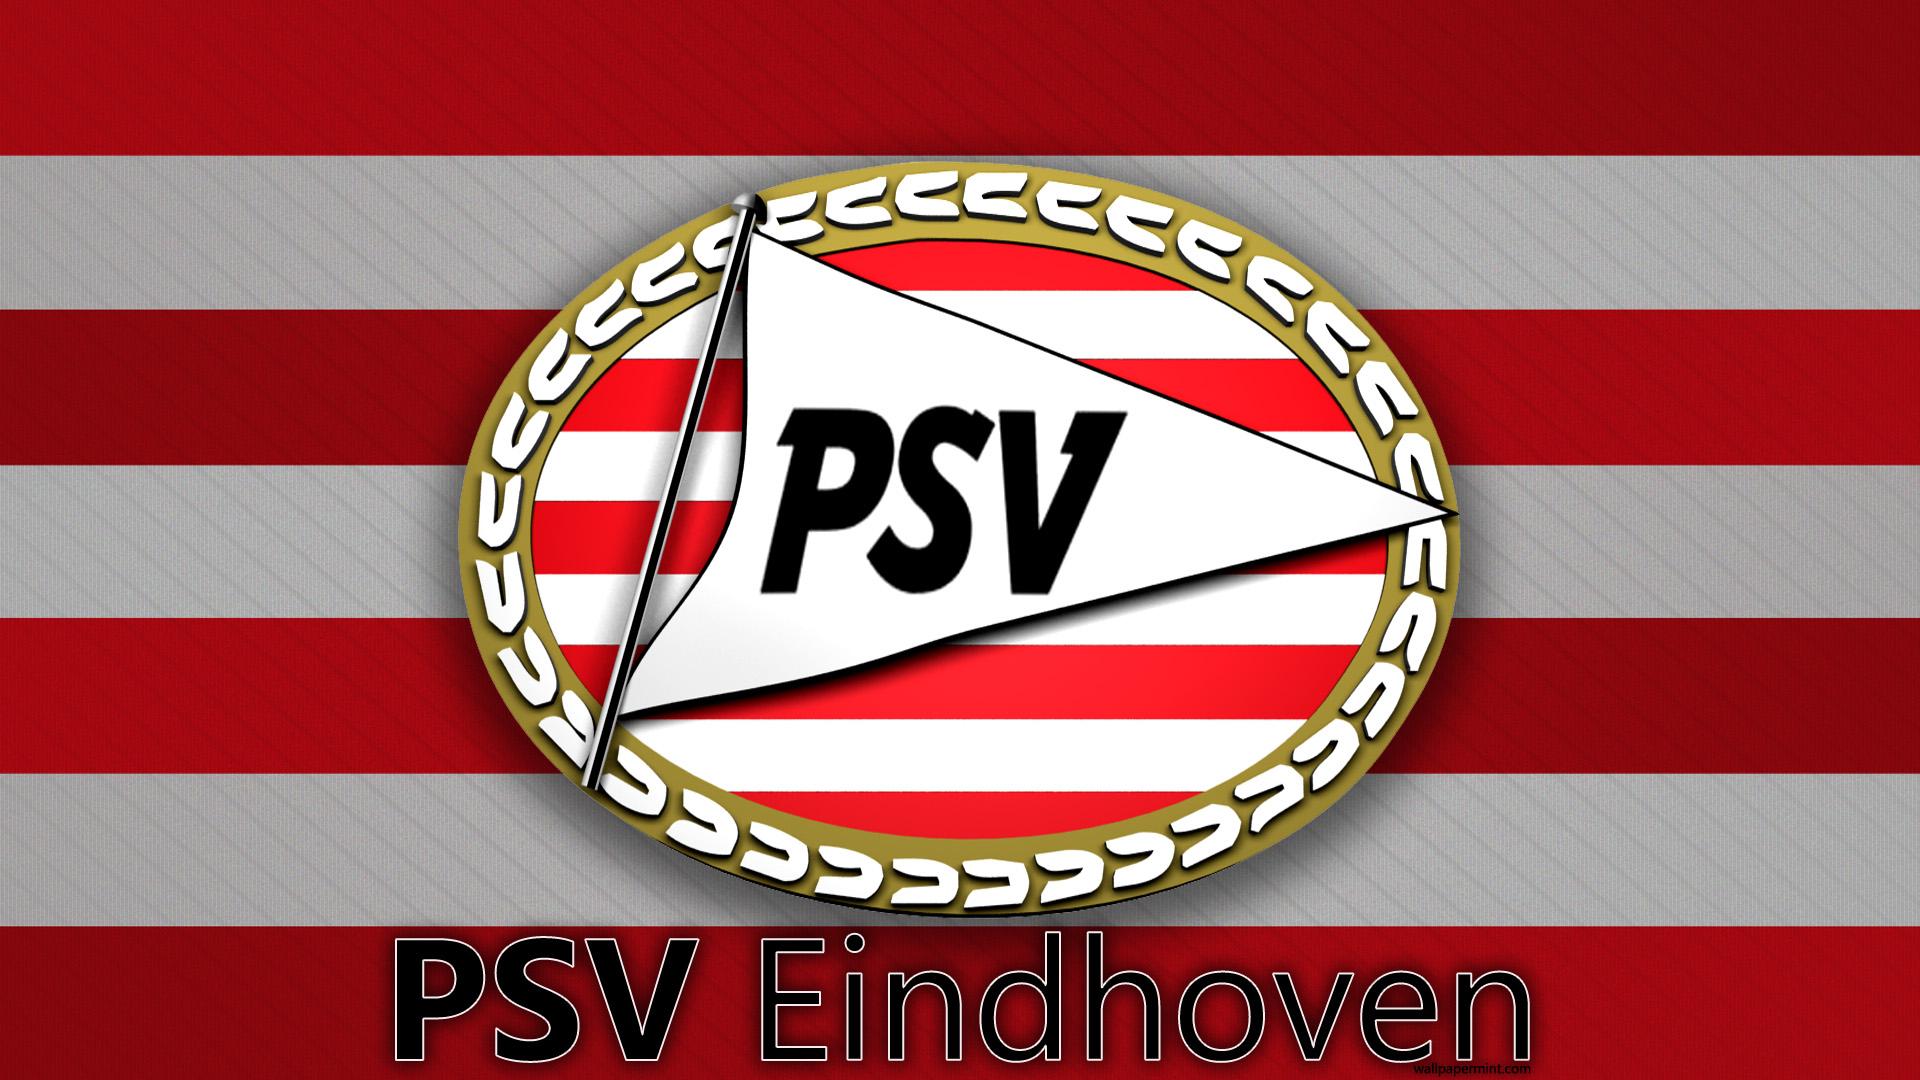 PSV Eindhoven Logo 3D Wallpaper